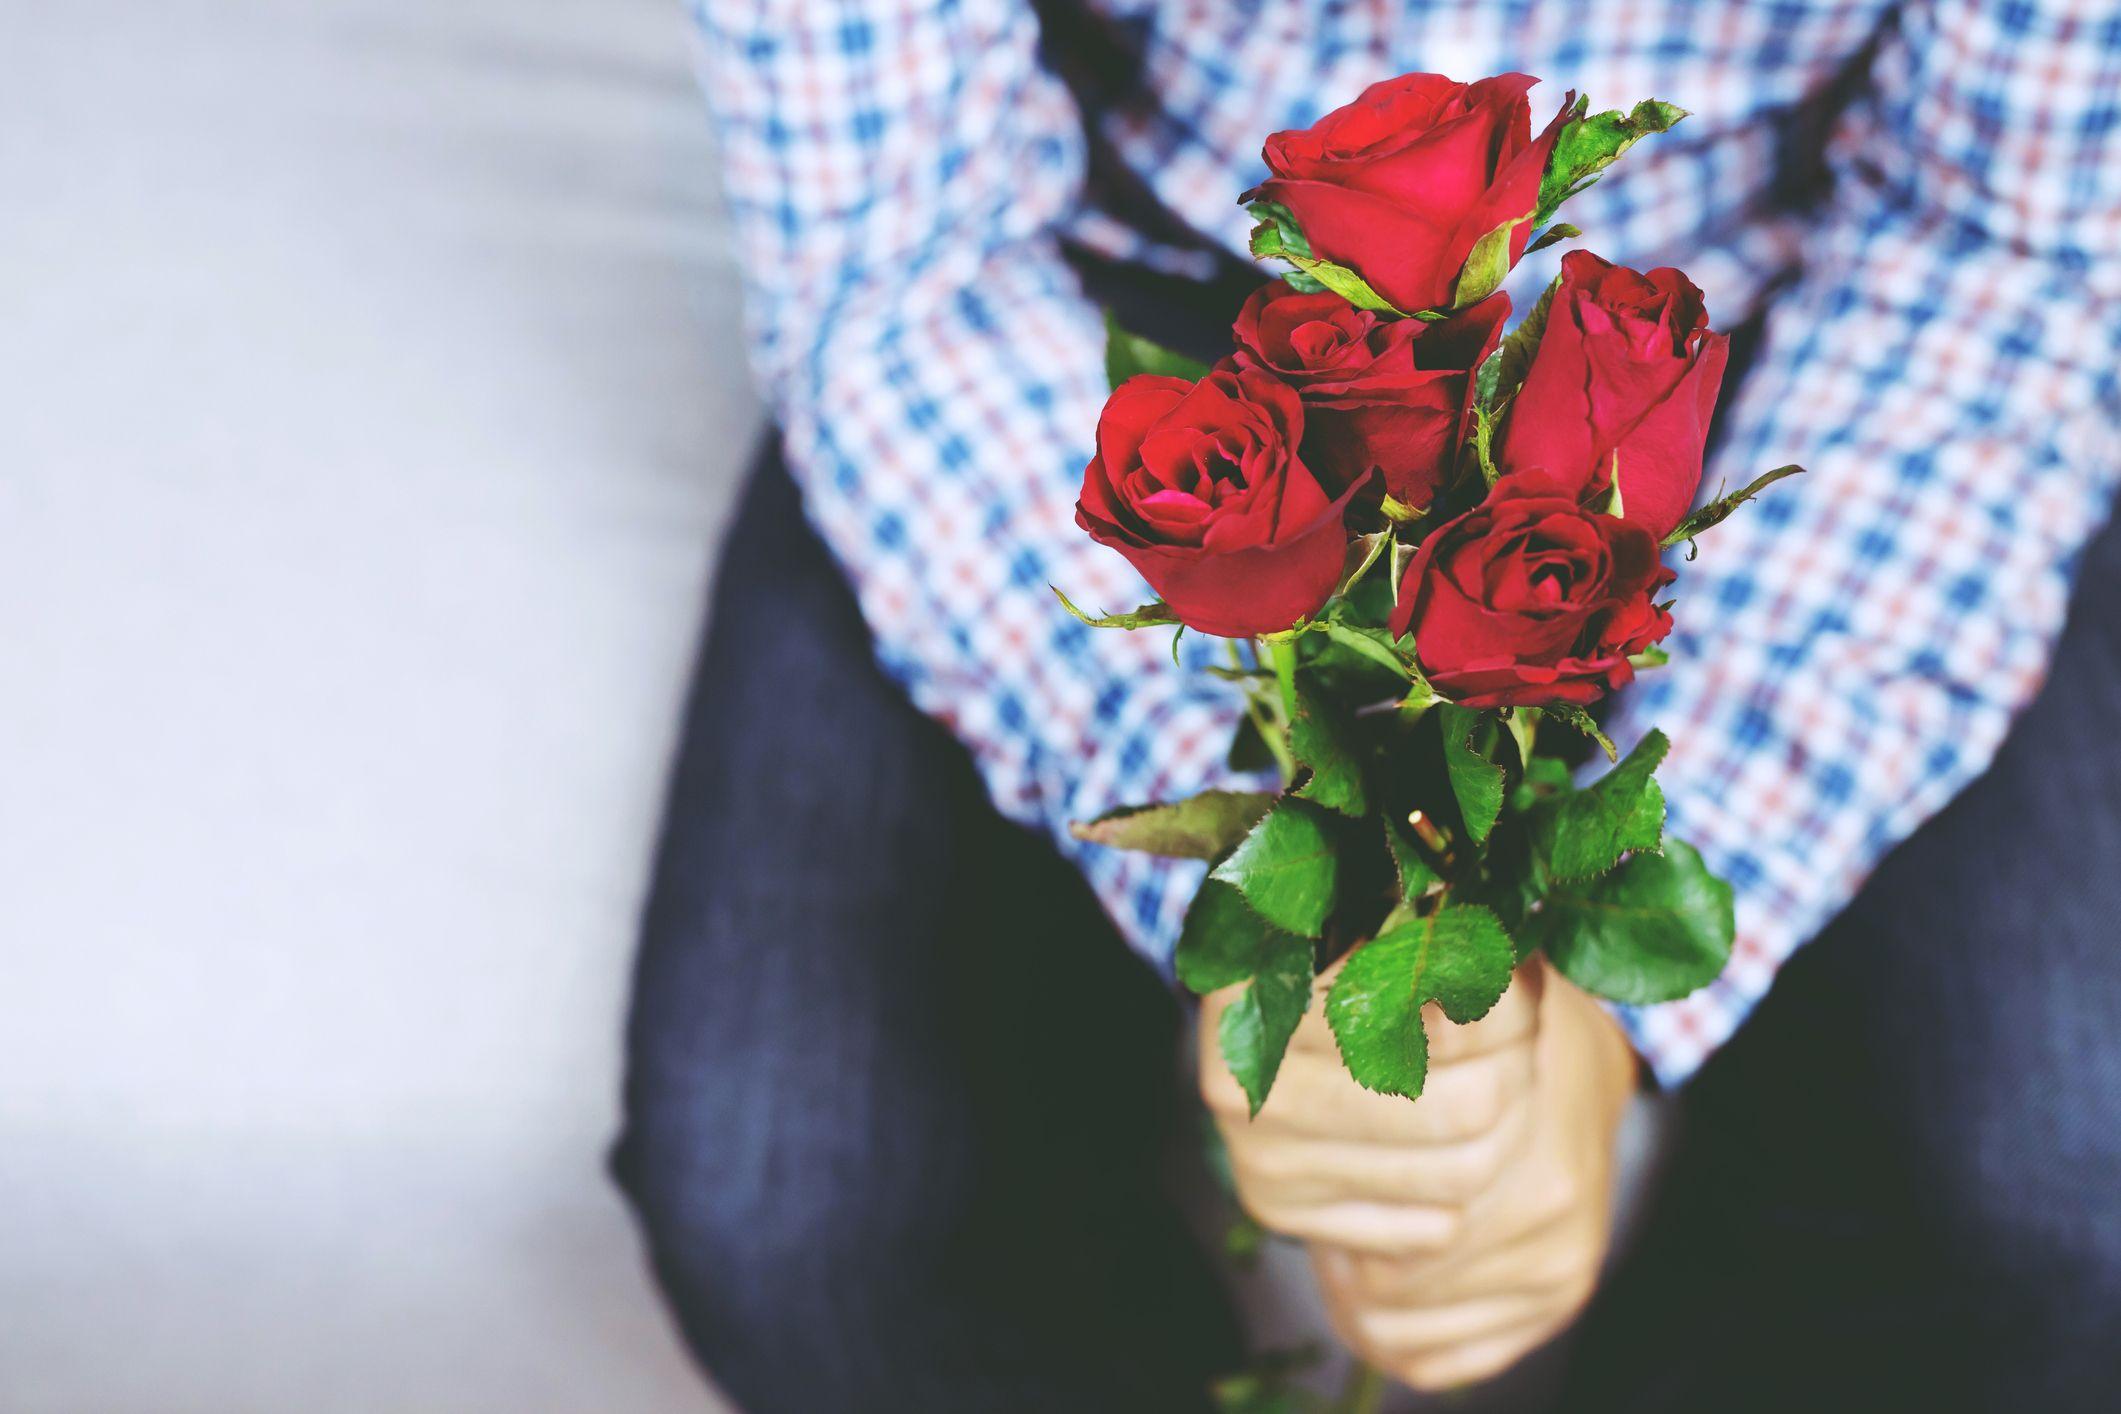 dating sites free valantine